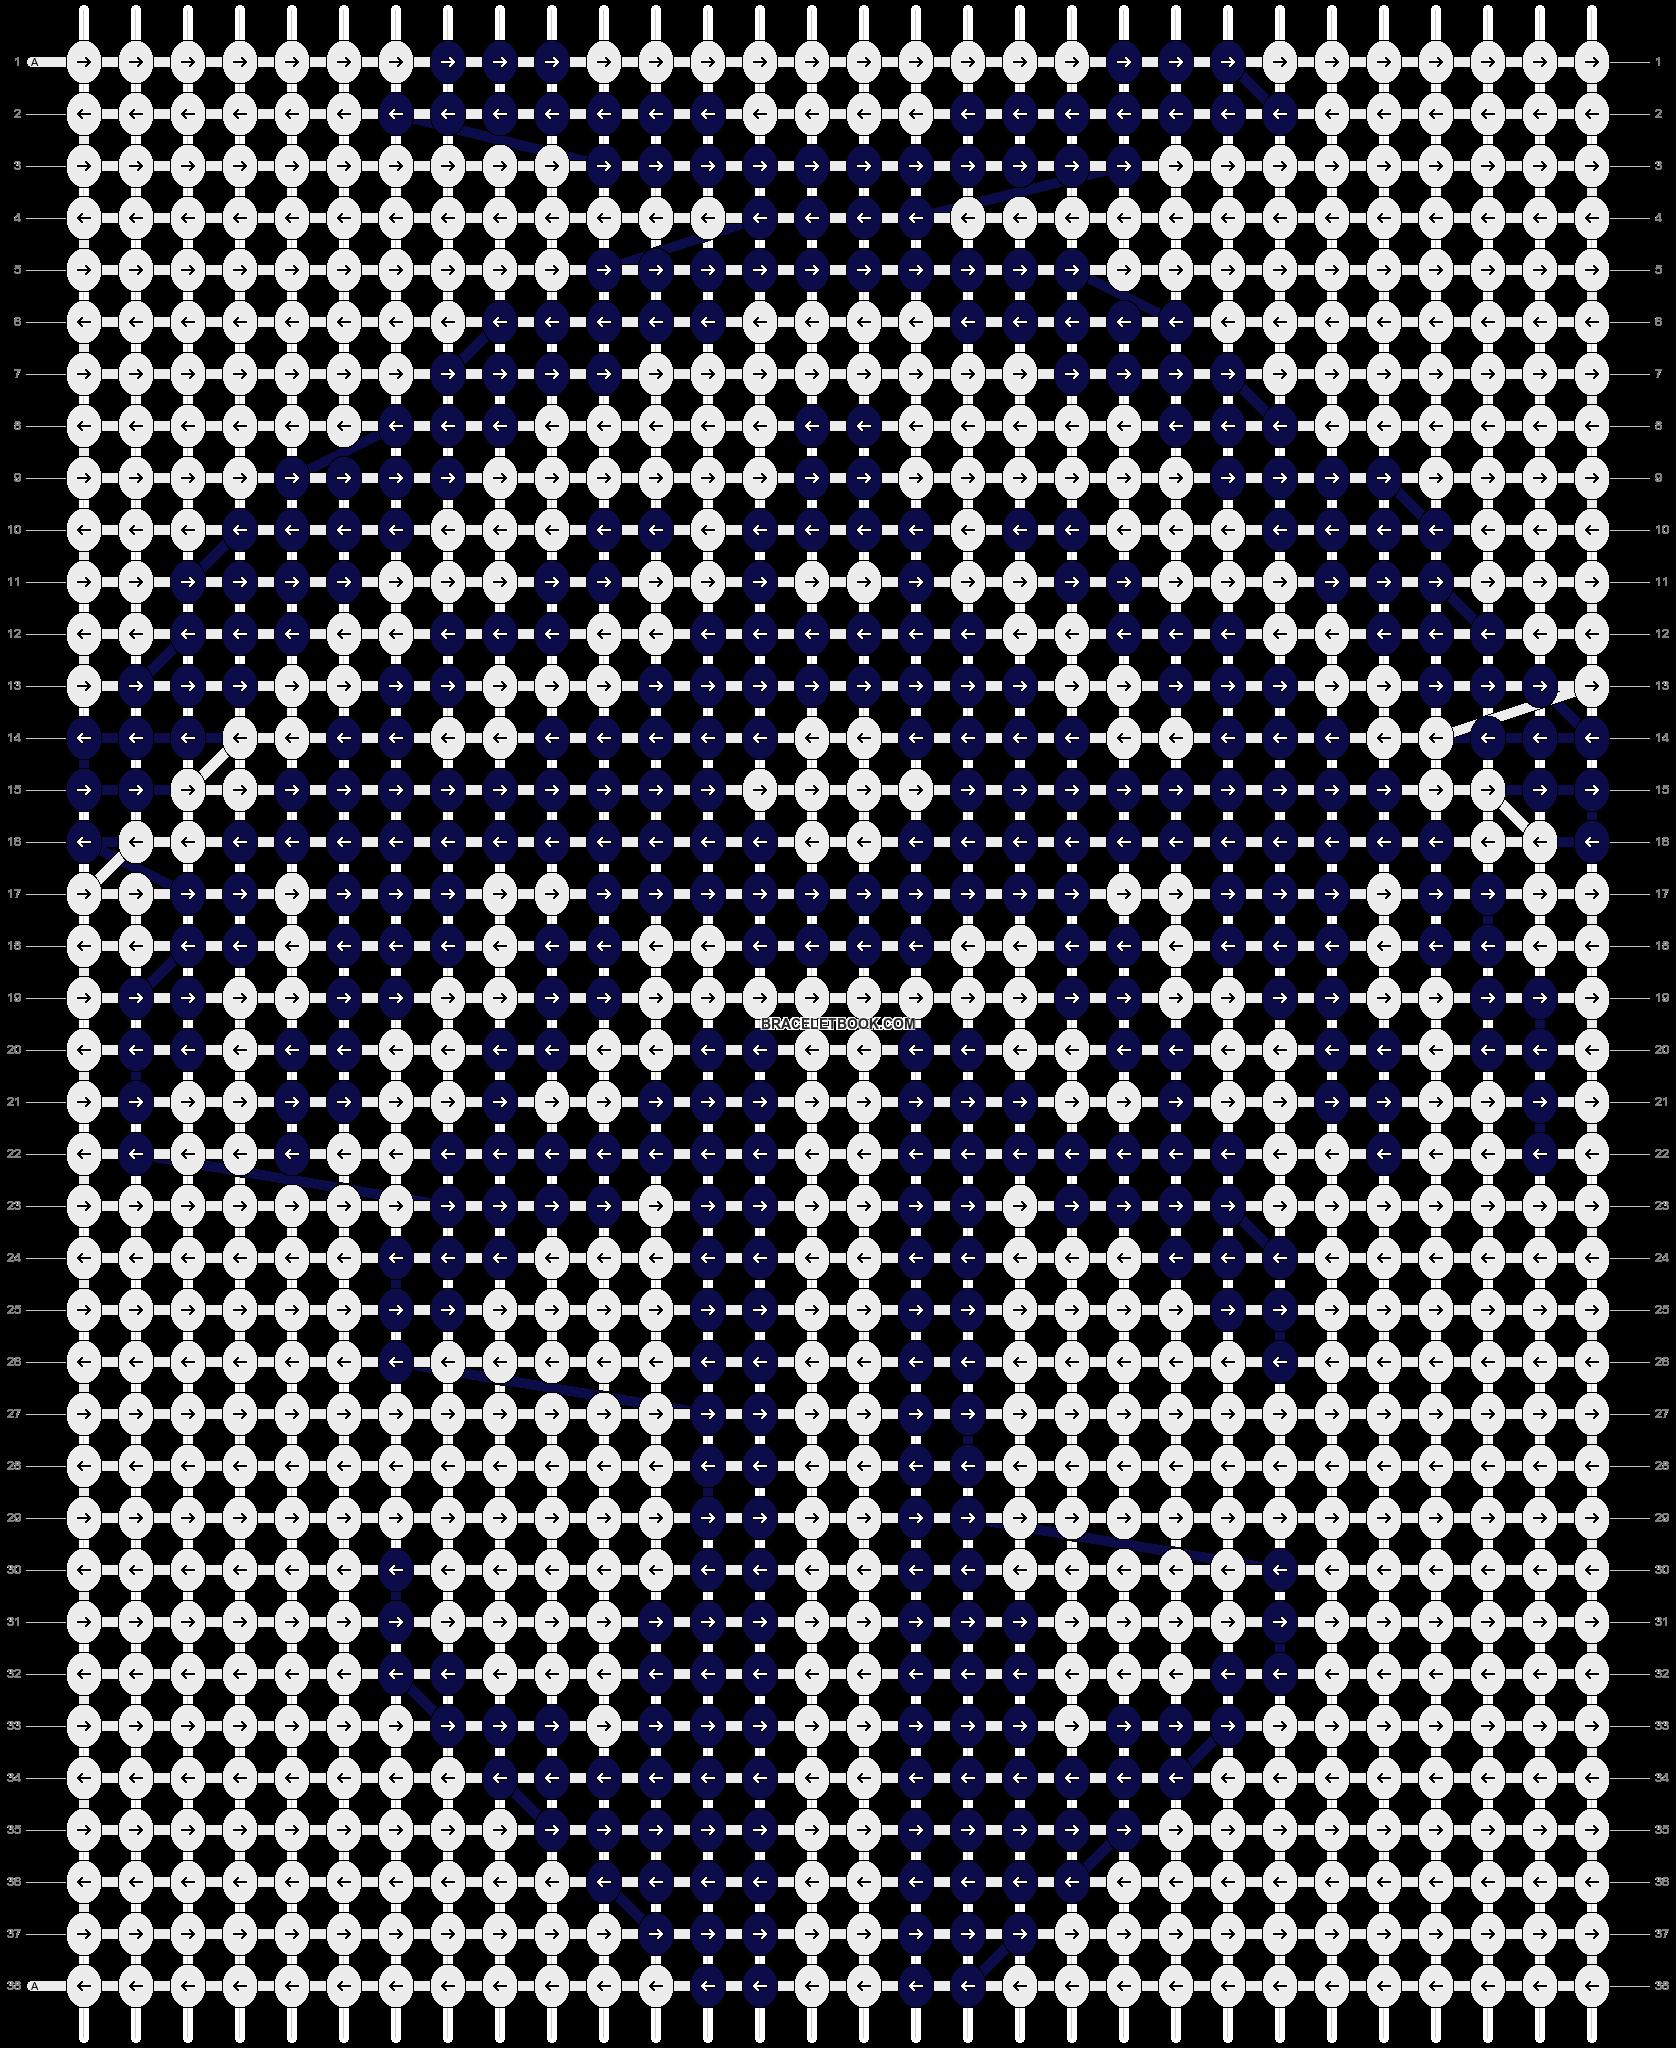 Alpha Pattern #21702 added by Rmawx3